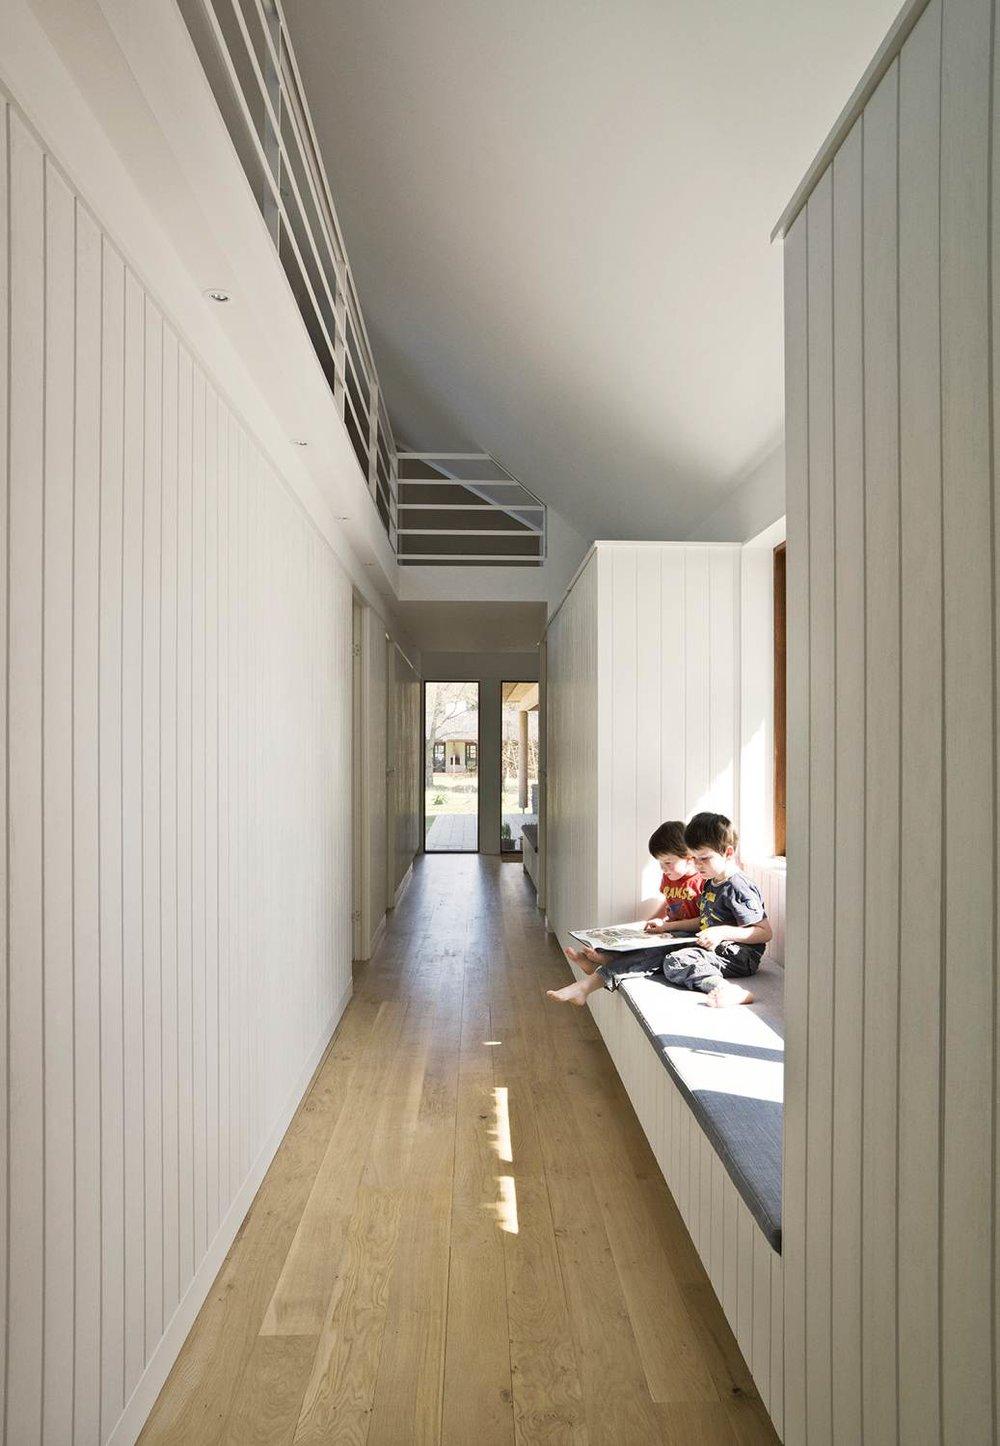 legio_projects_rørvig2_5_sommerhus_interior.jpg